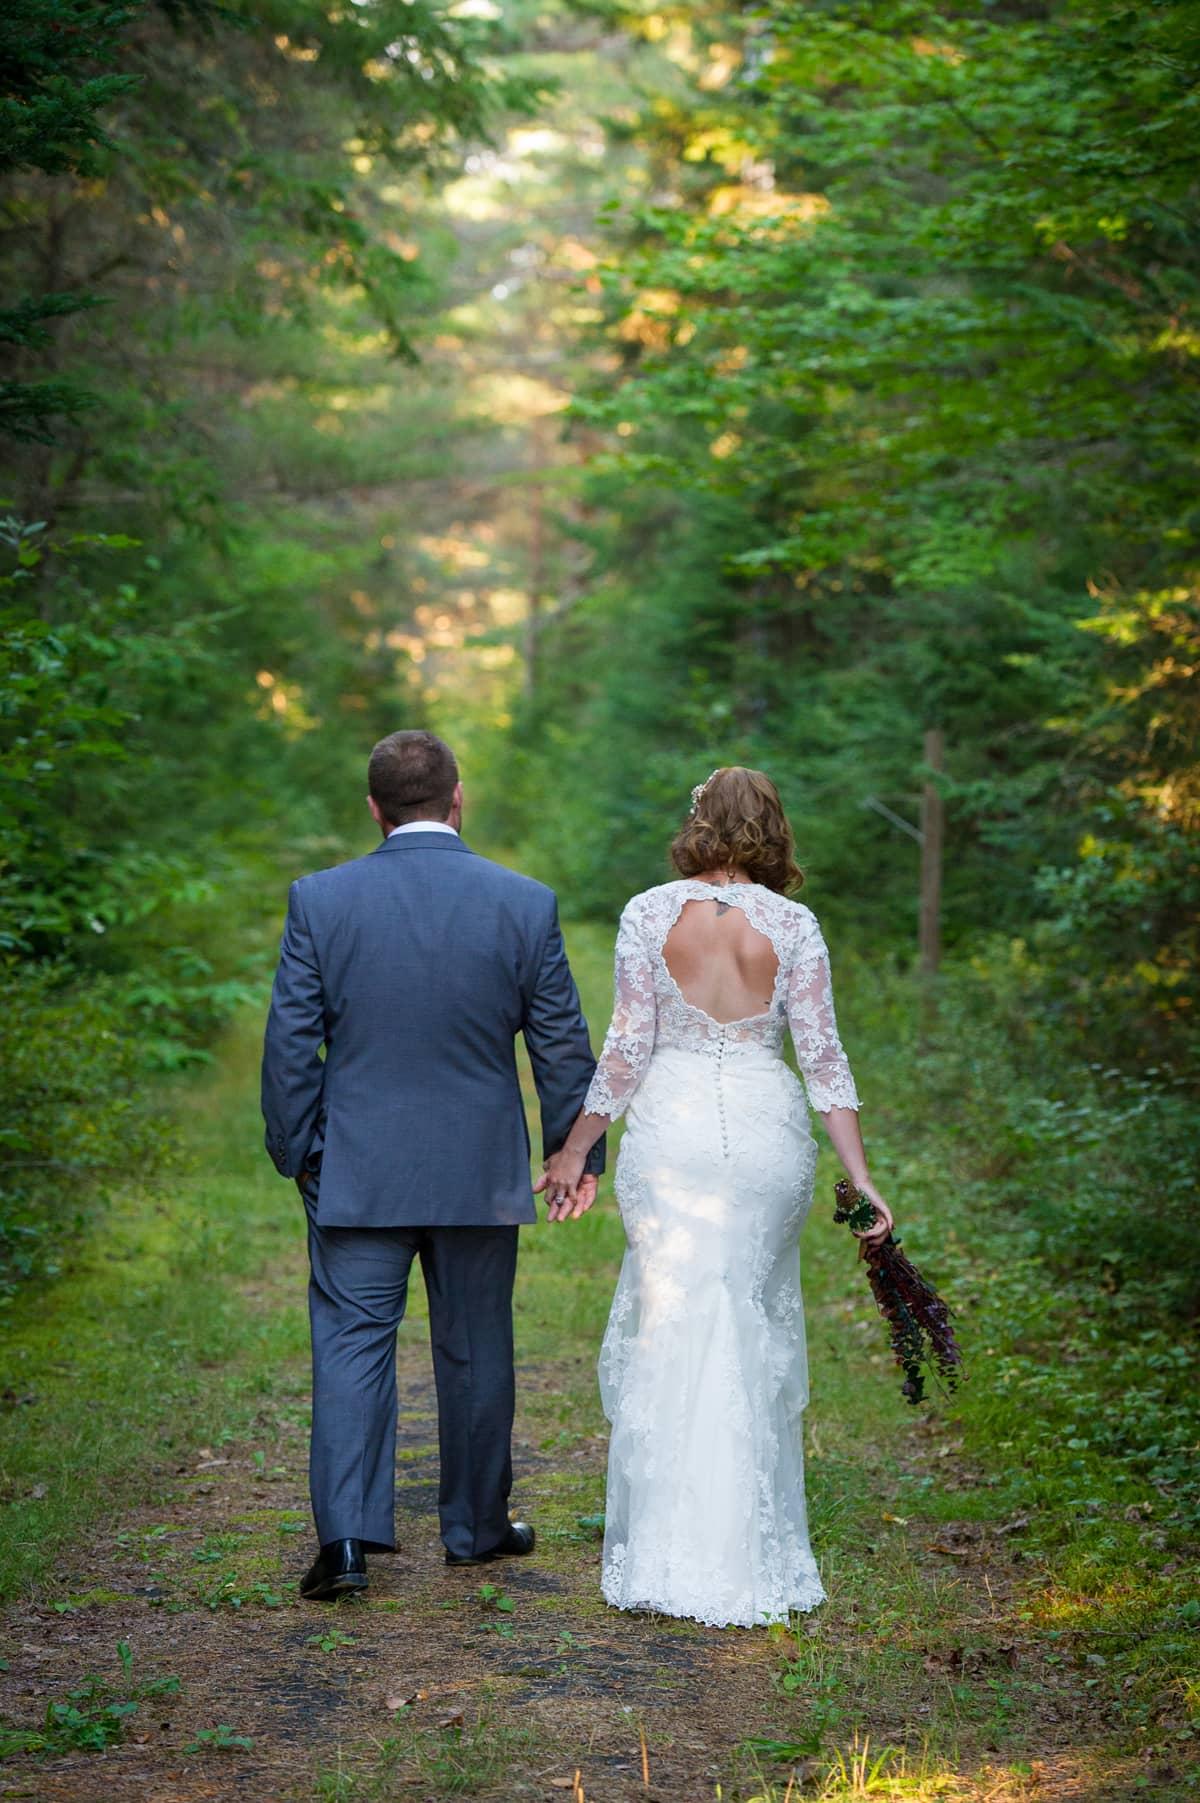 Unique Nature-based Weddings